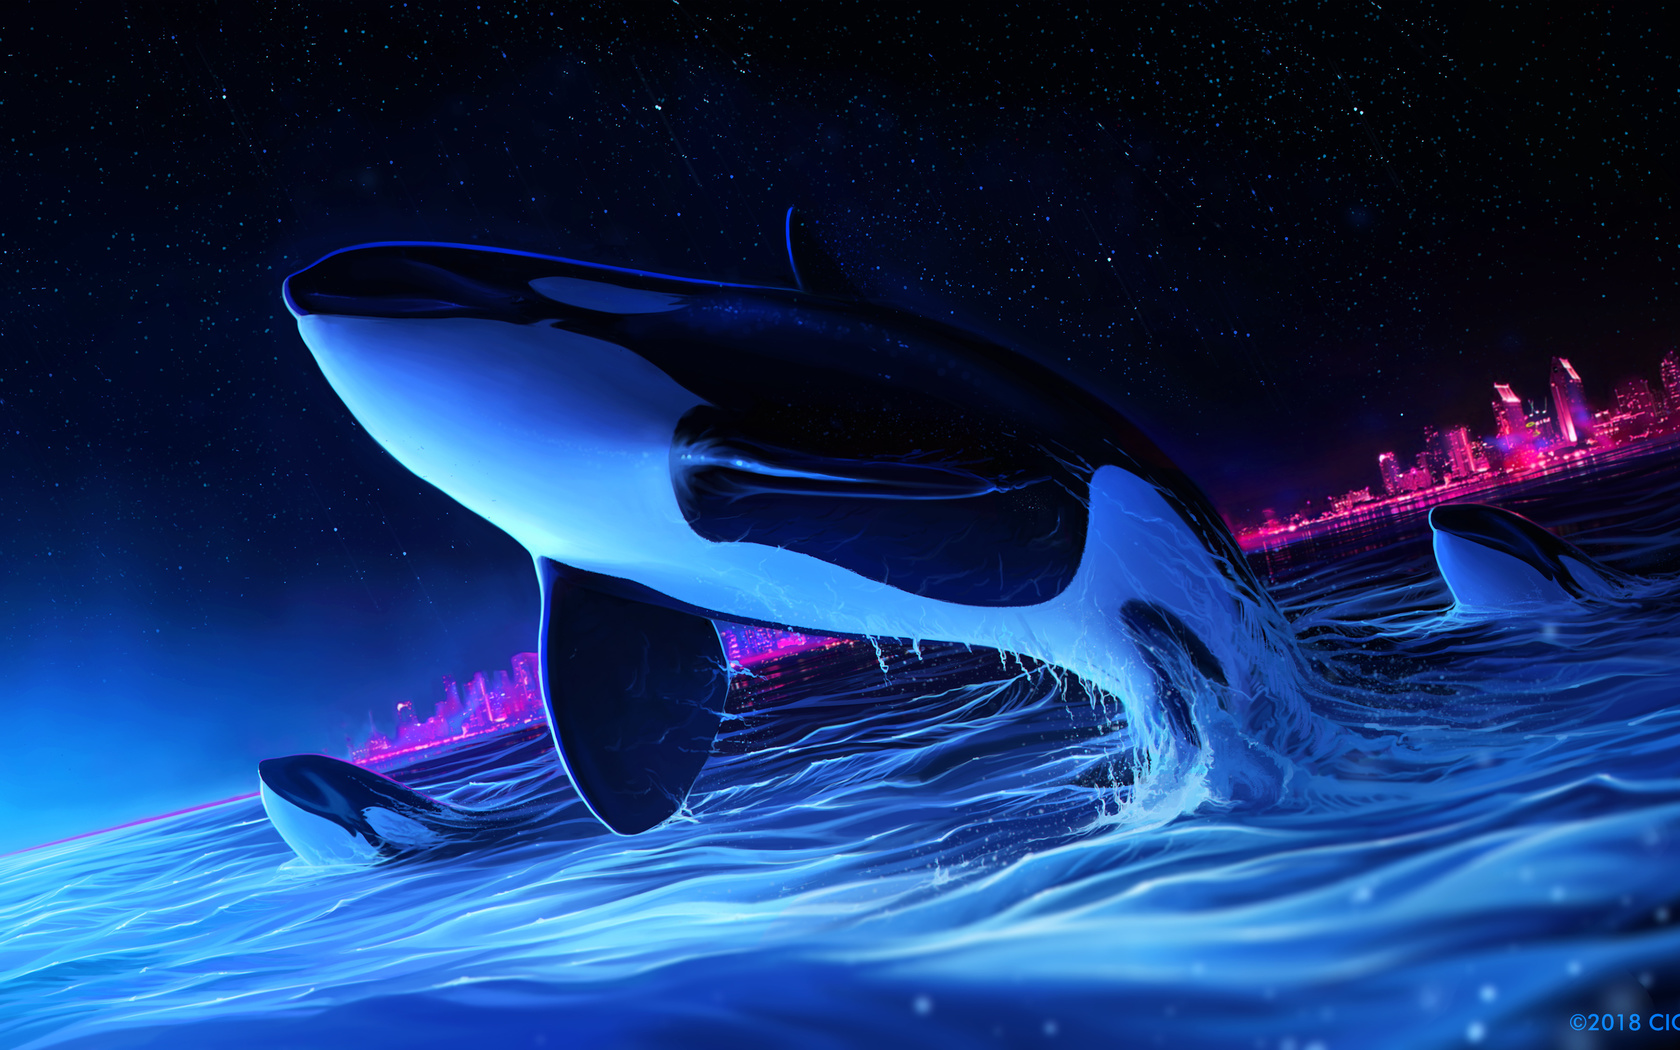 dolphin, night, orca, whale, digital art